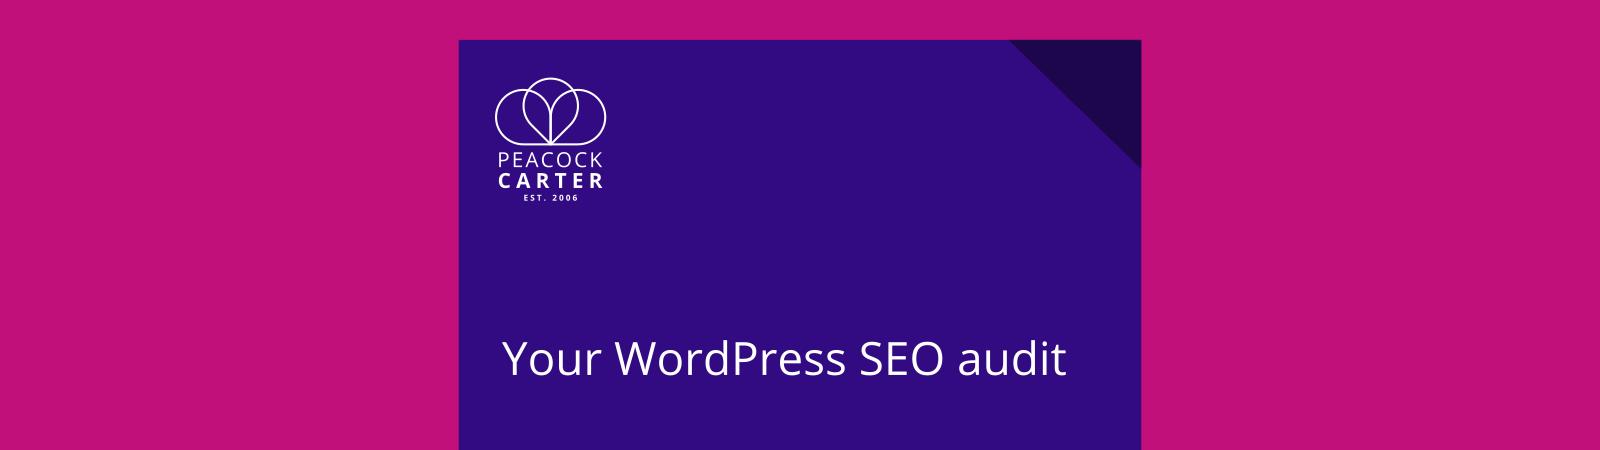 WordPress SEO audits for websites